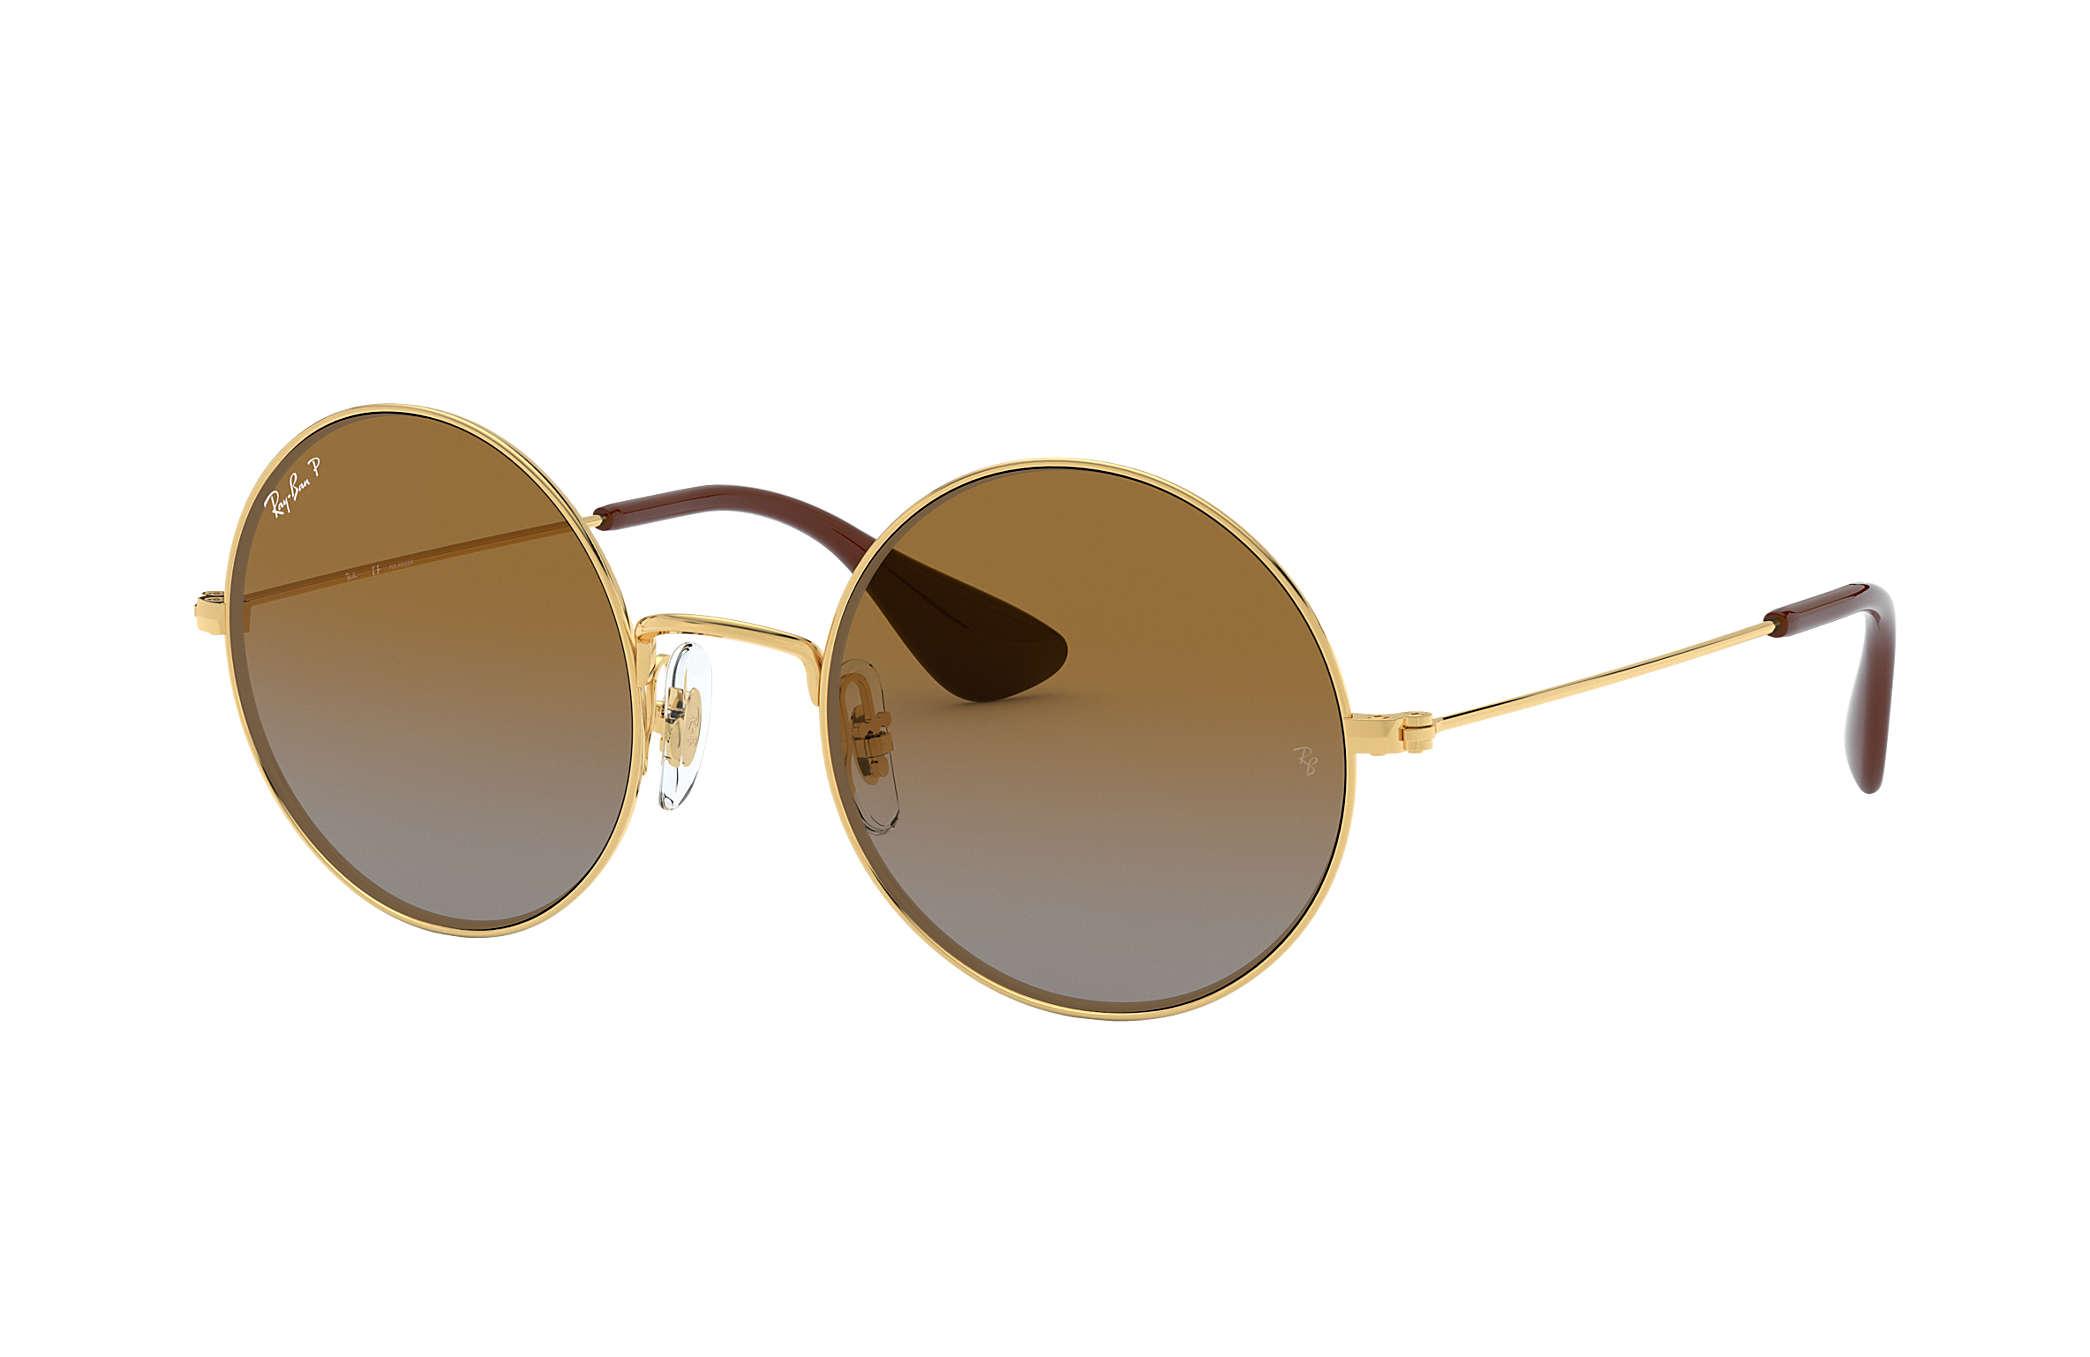 0871142c0 Ray-Ban Ja-jo RB3592 Gold - Metal - Brown Polarized Lenses ...